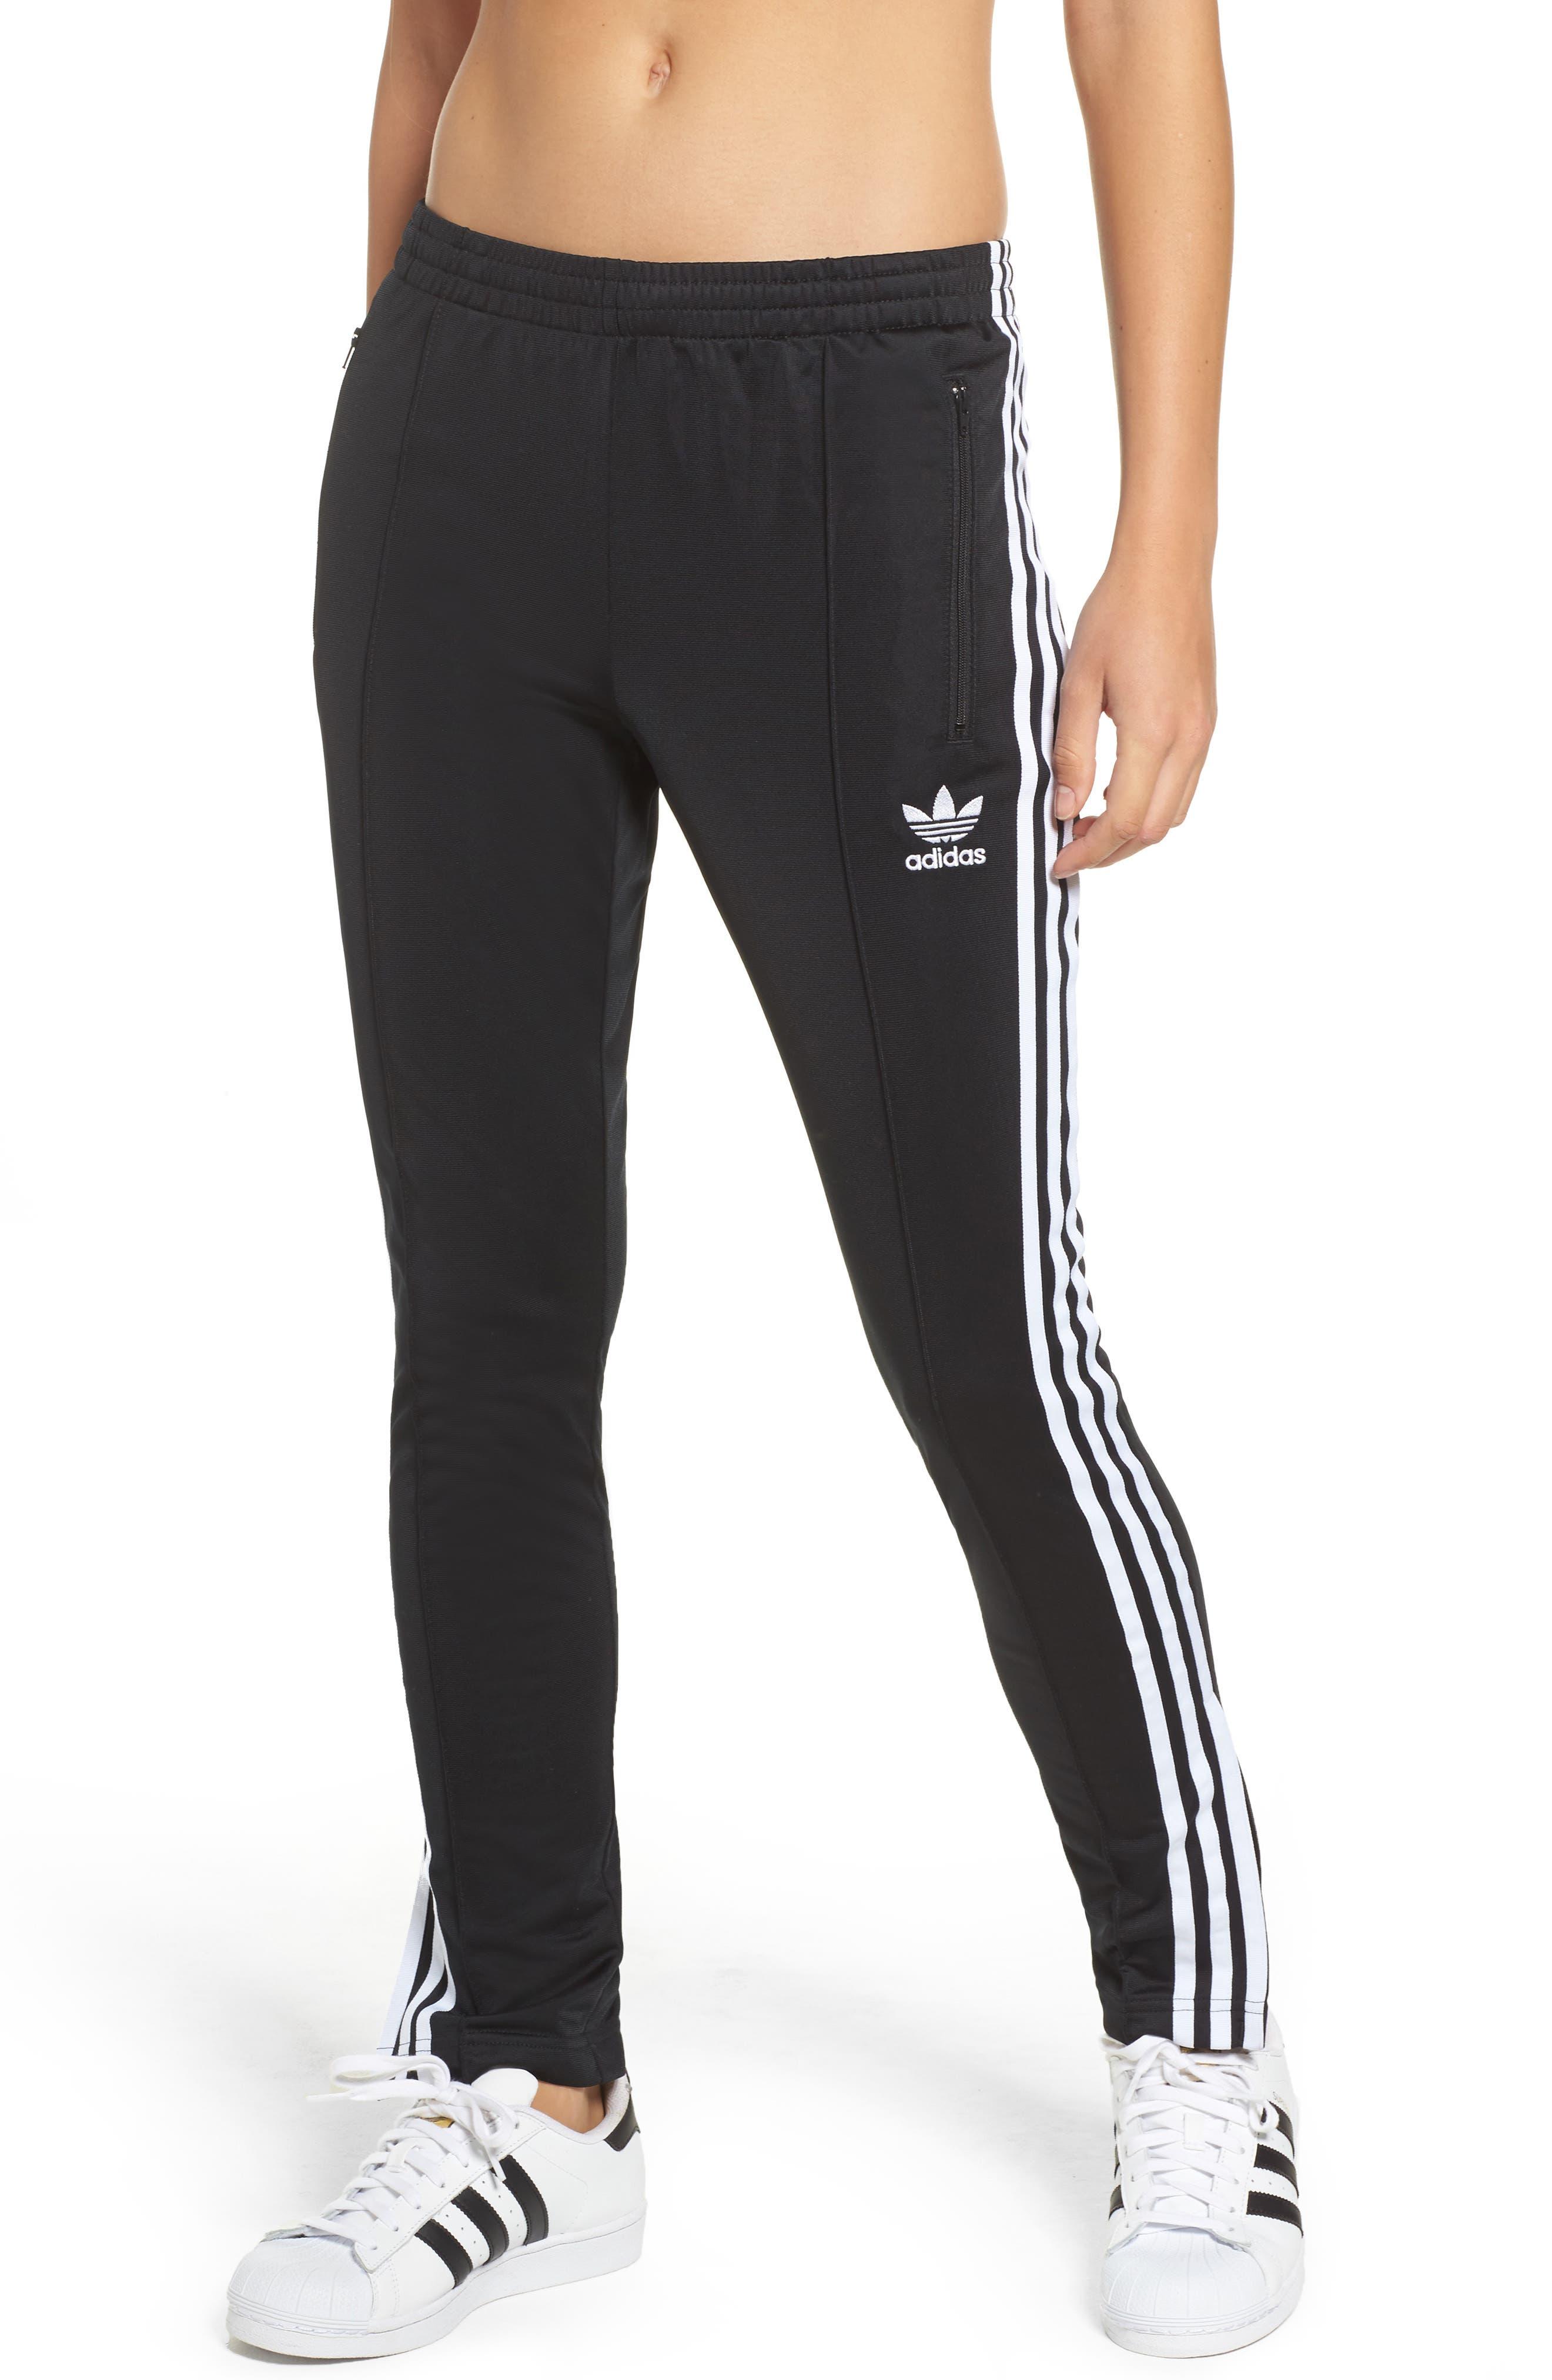 Originals Superstar Track Pants,                         Main,                         color, Black